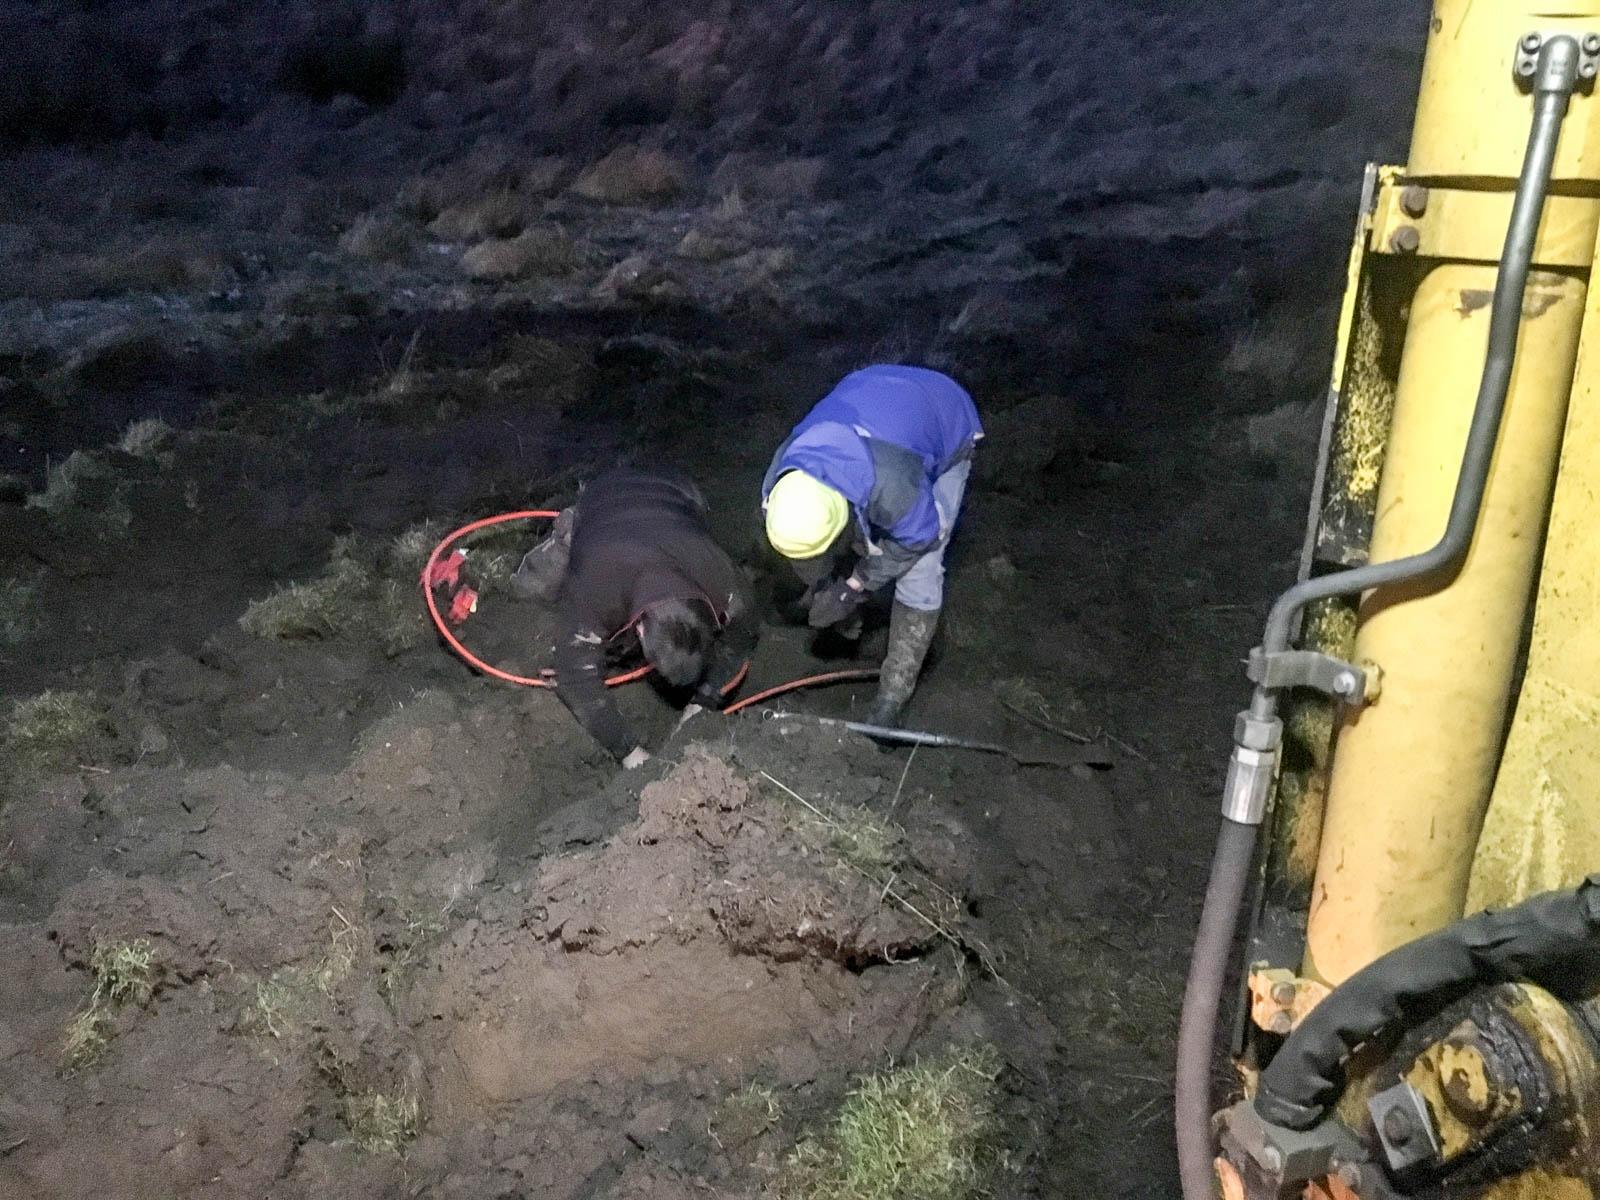 Dedication - digging in the dark